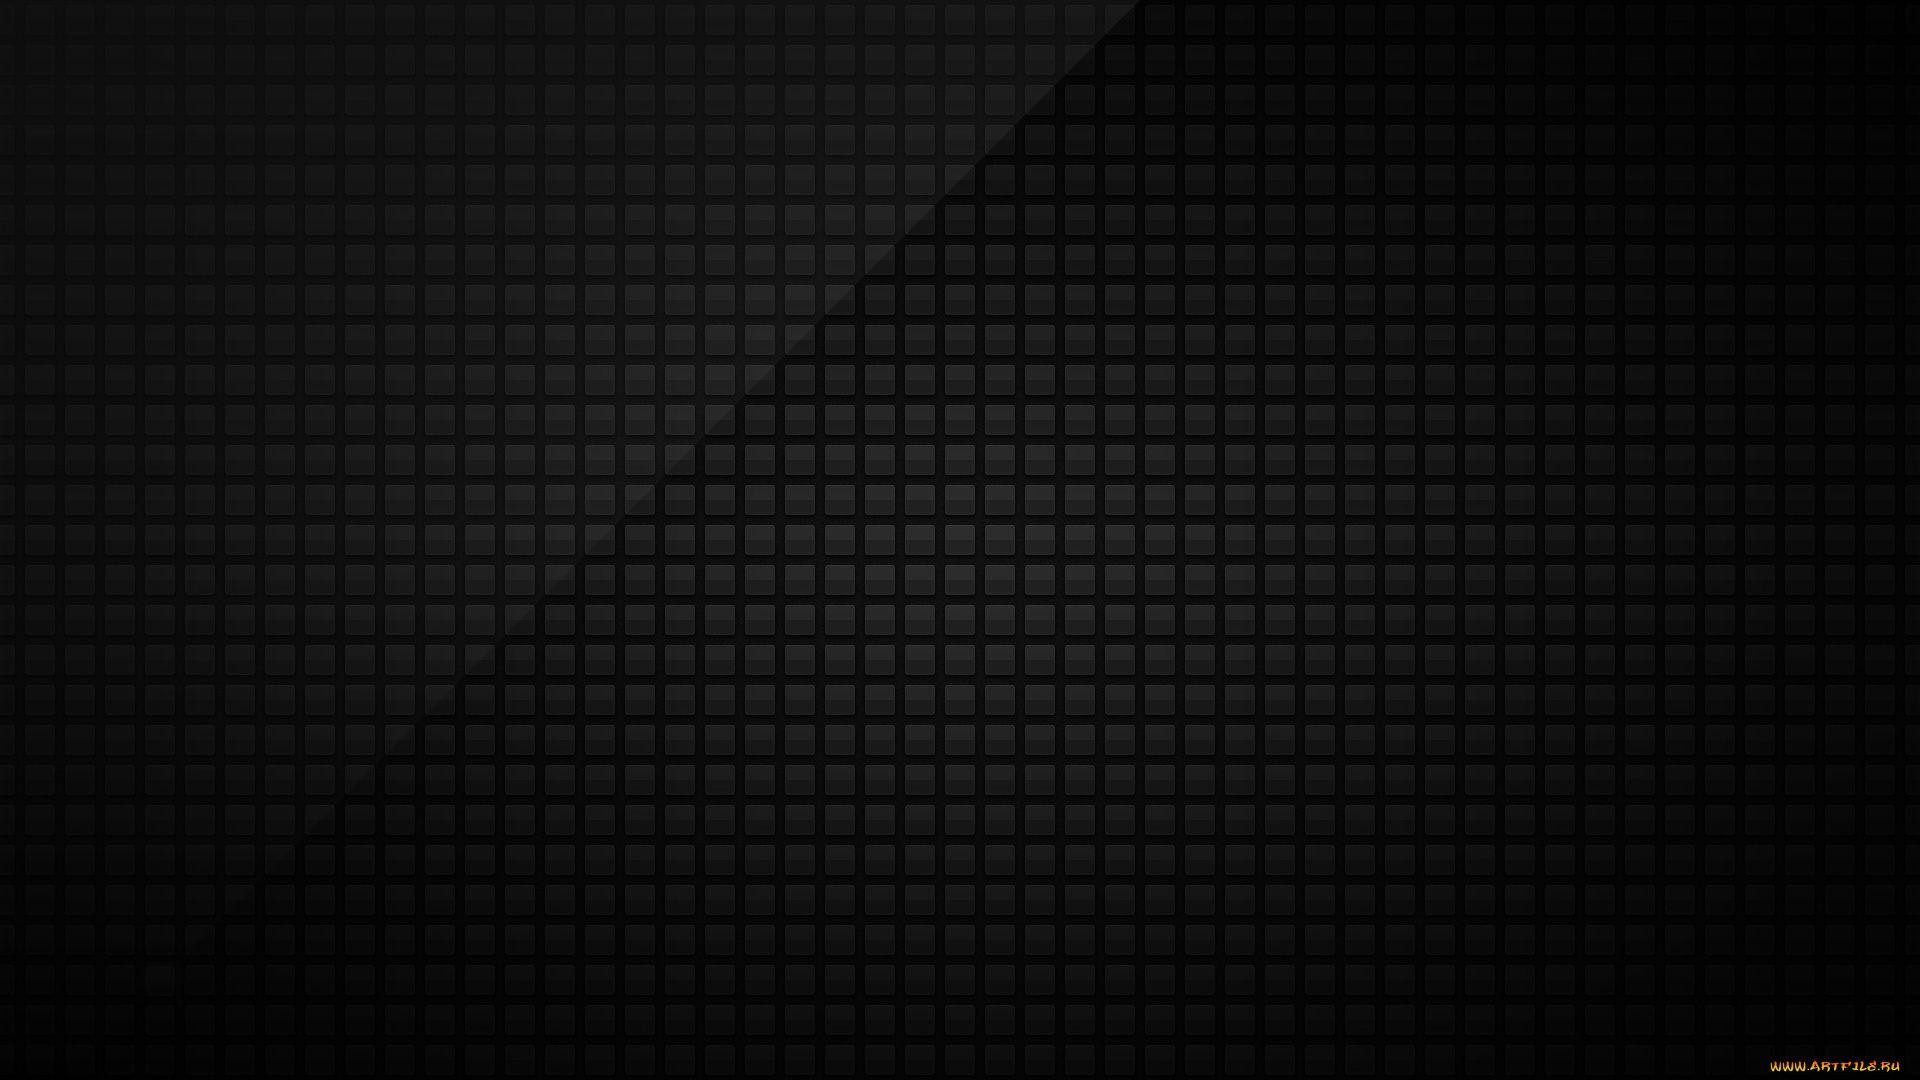 Best Background For Website 1080p